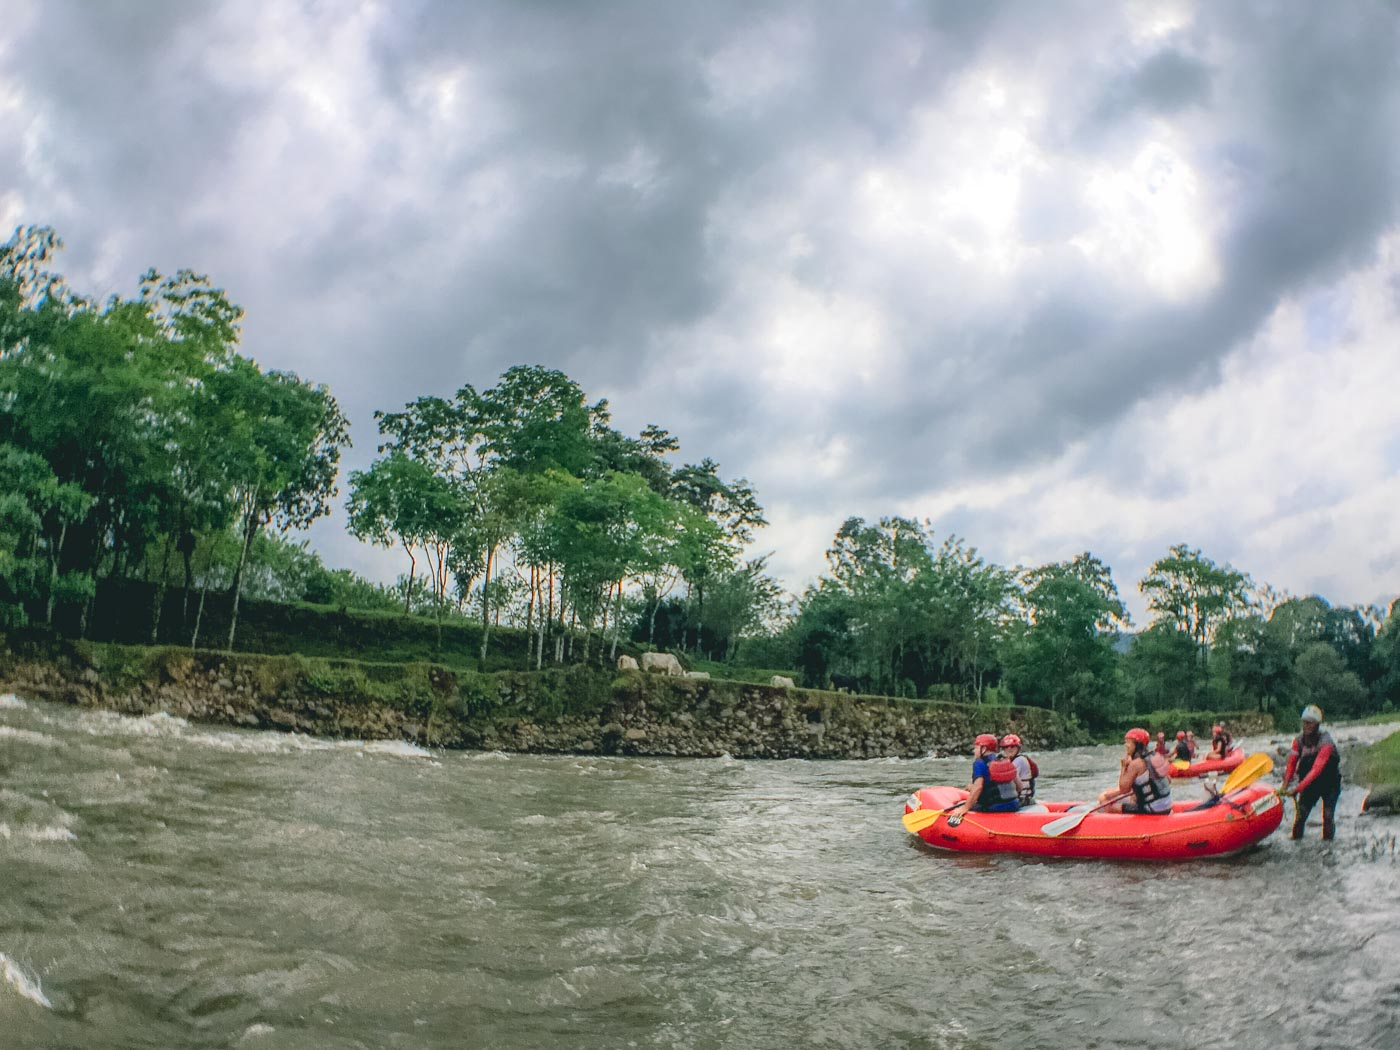 Arenal Costa Rica: River Rafting on Rio Balsa